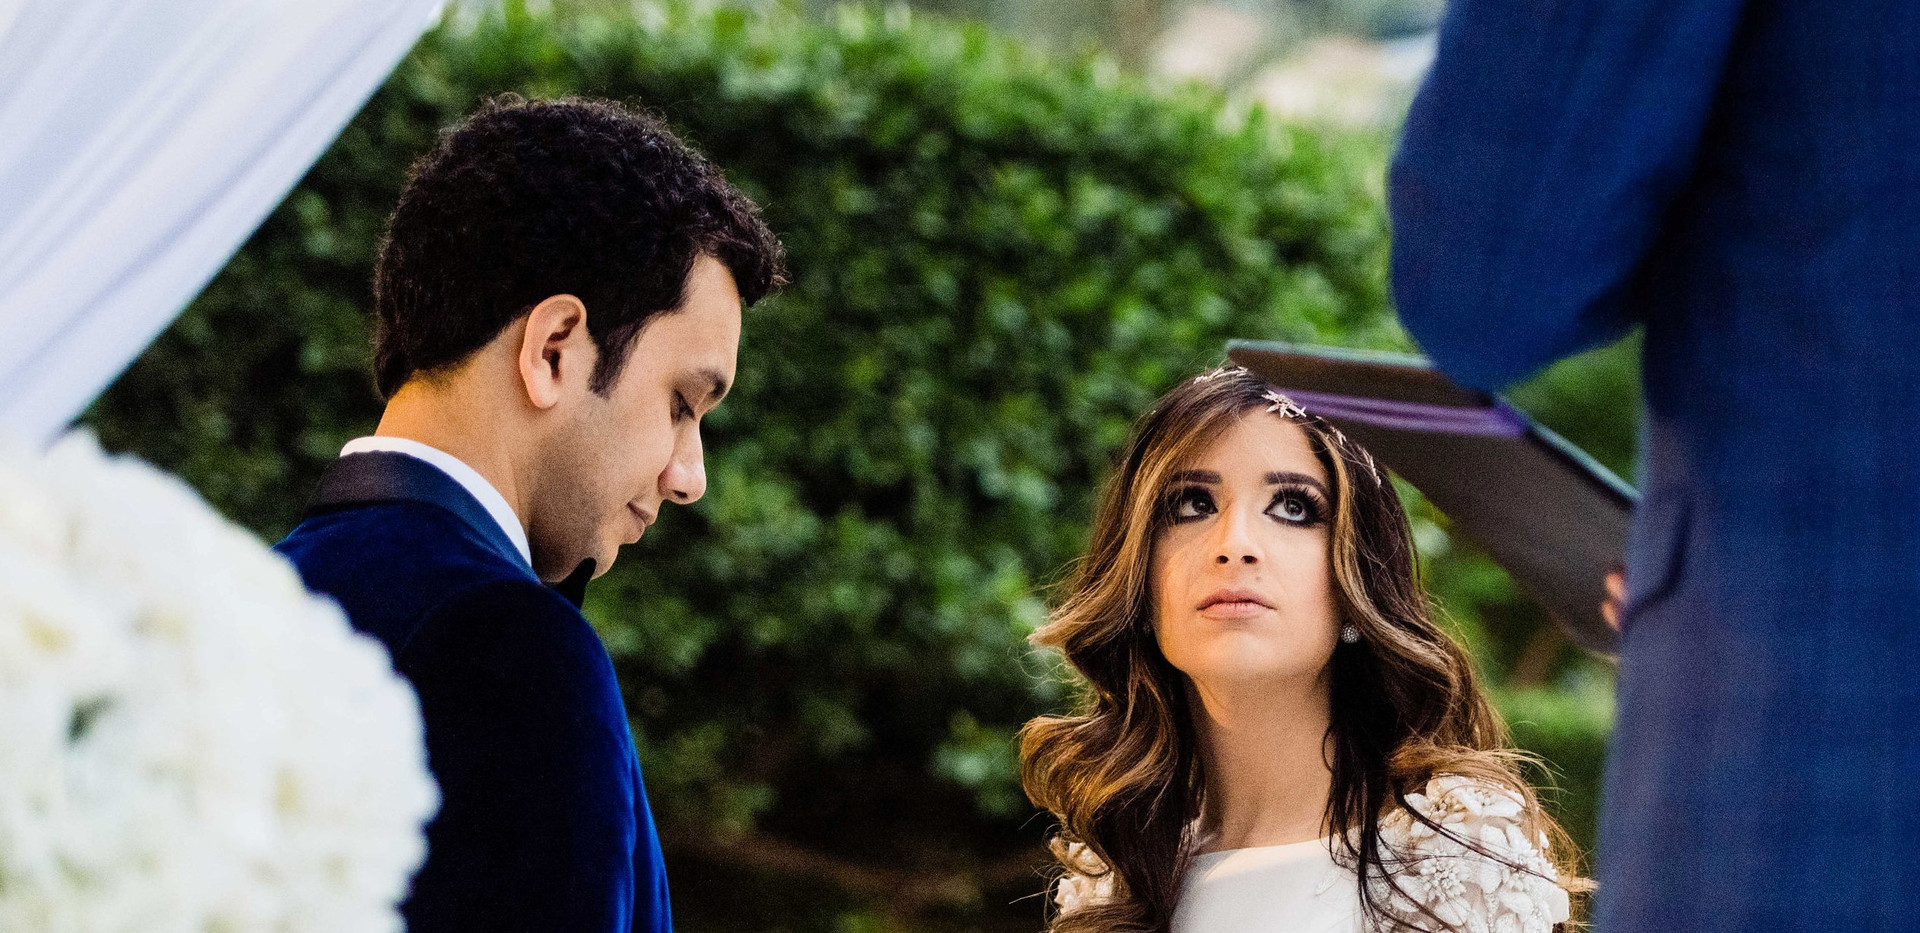 Lorena and Husam